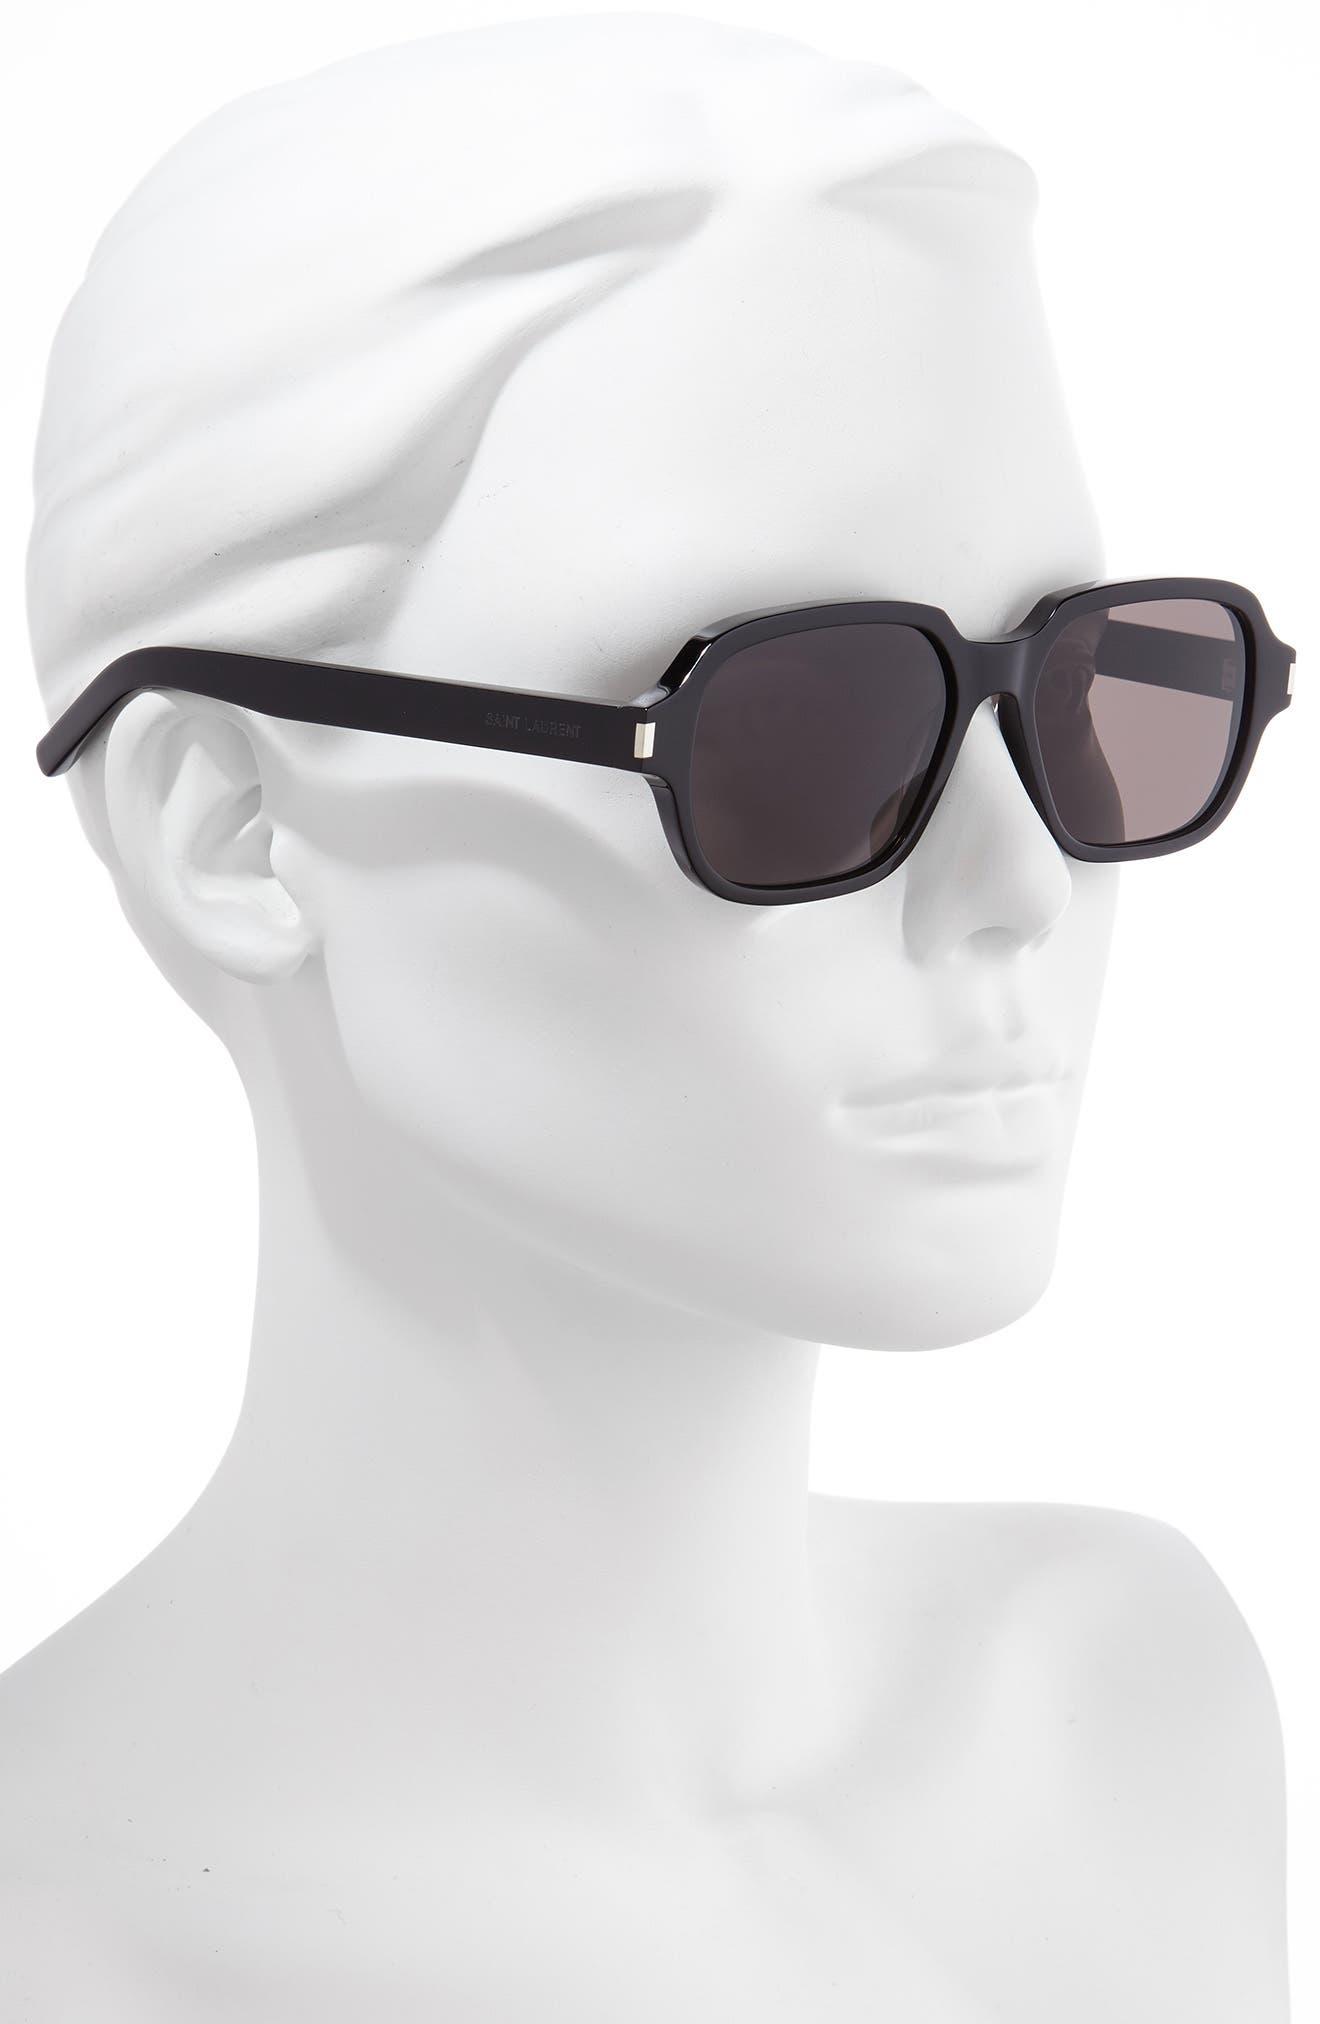 SAINT LAURENT, 53mm Rectangle Sunglasses, Alternate thumbnail 2, color, SHINY BLACK/ GREY SOLID